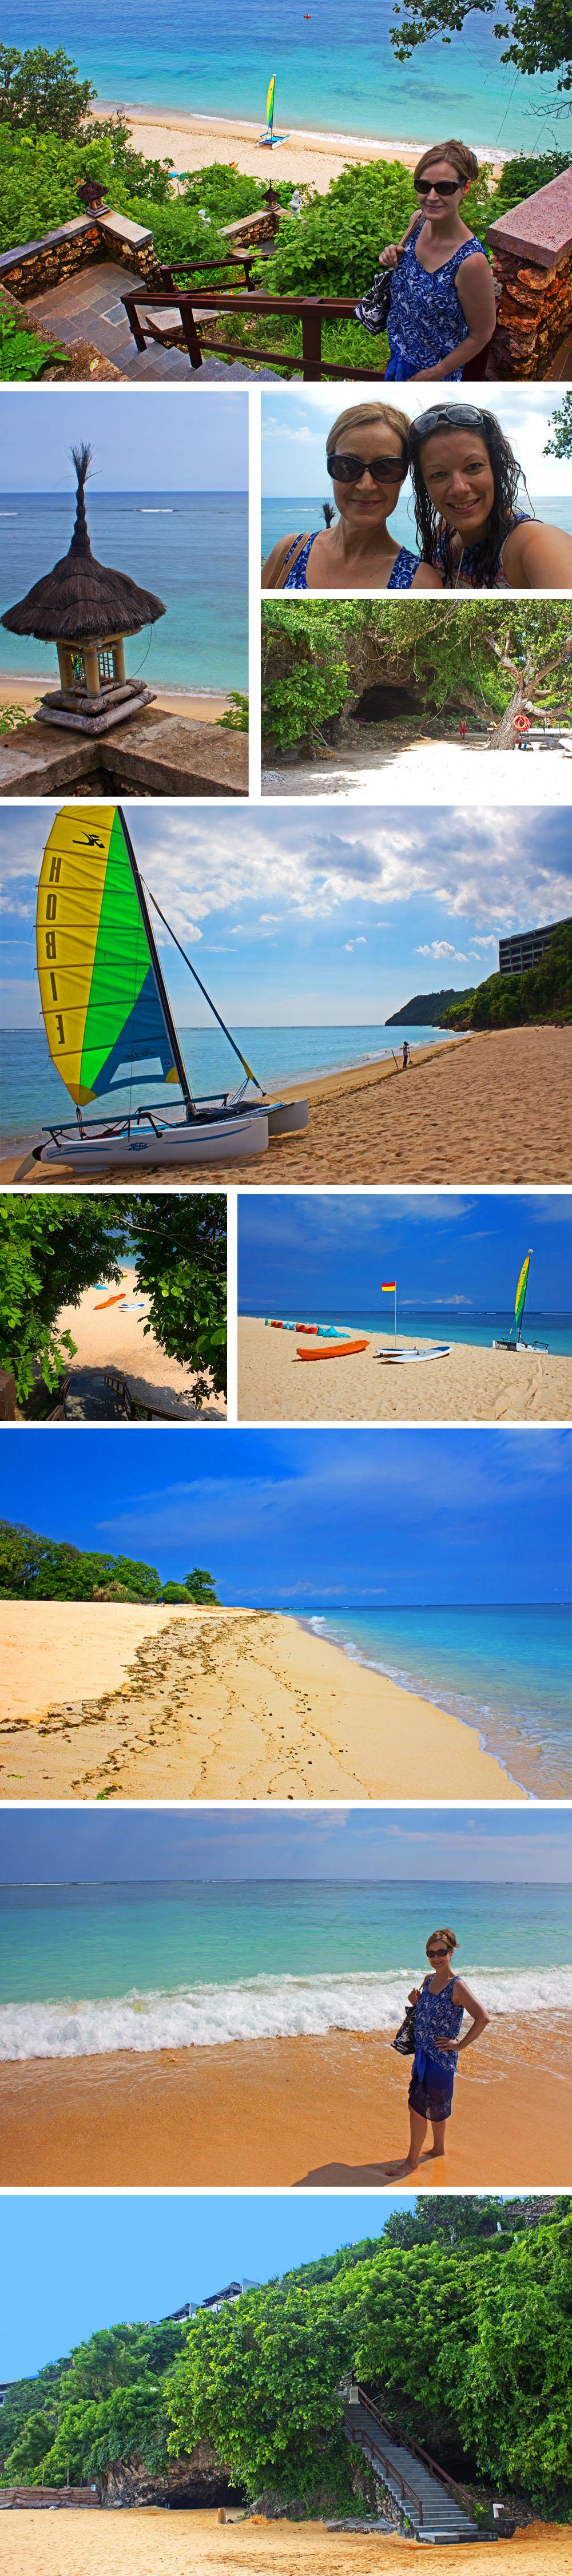 Samabe Bali Beach